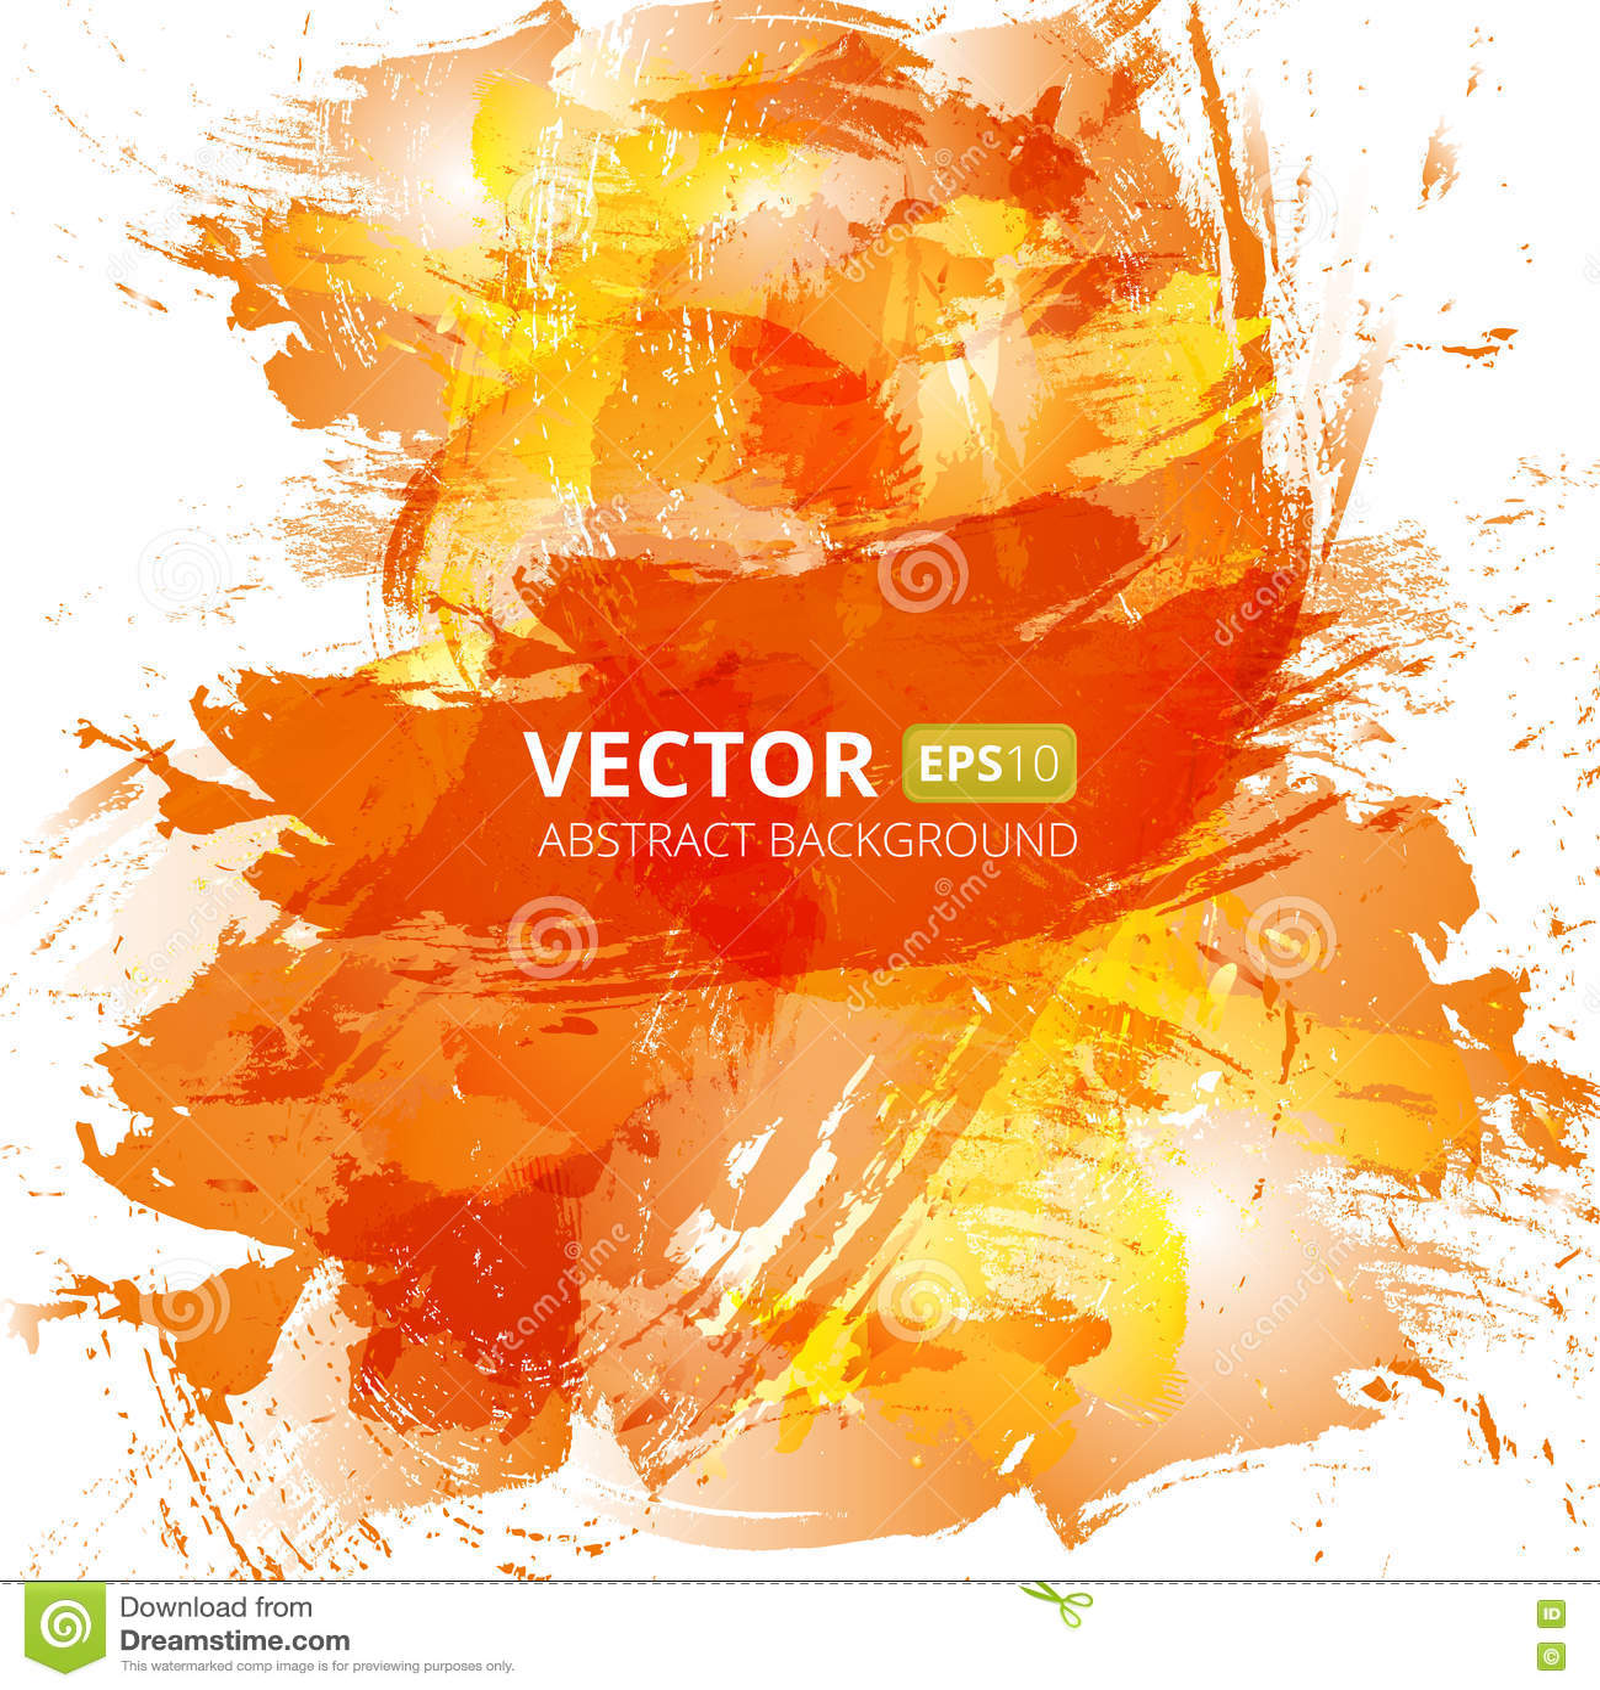 Abstract Vector Orange Watercolor Background Stock Vector